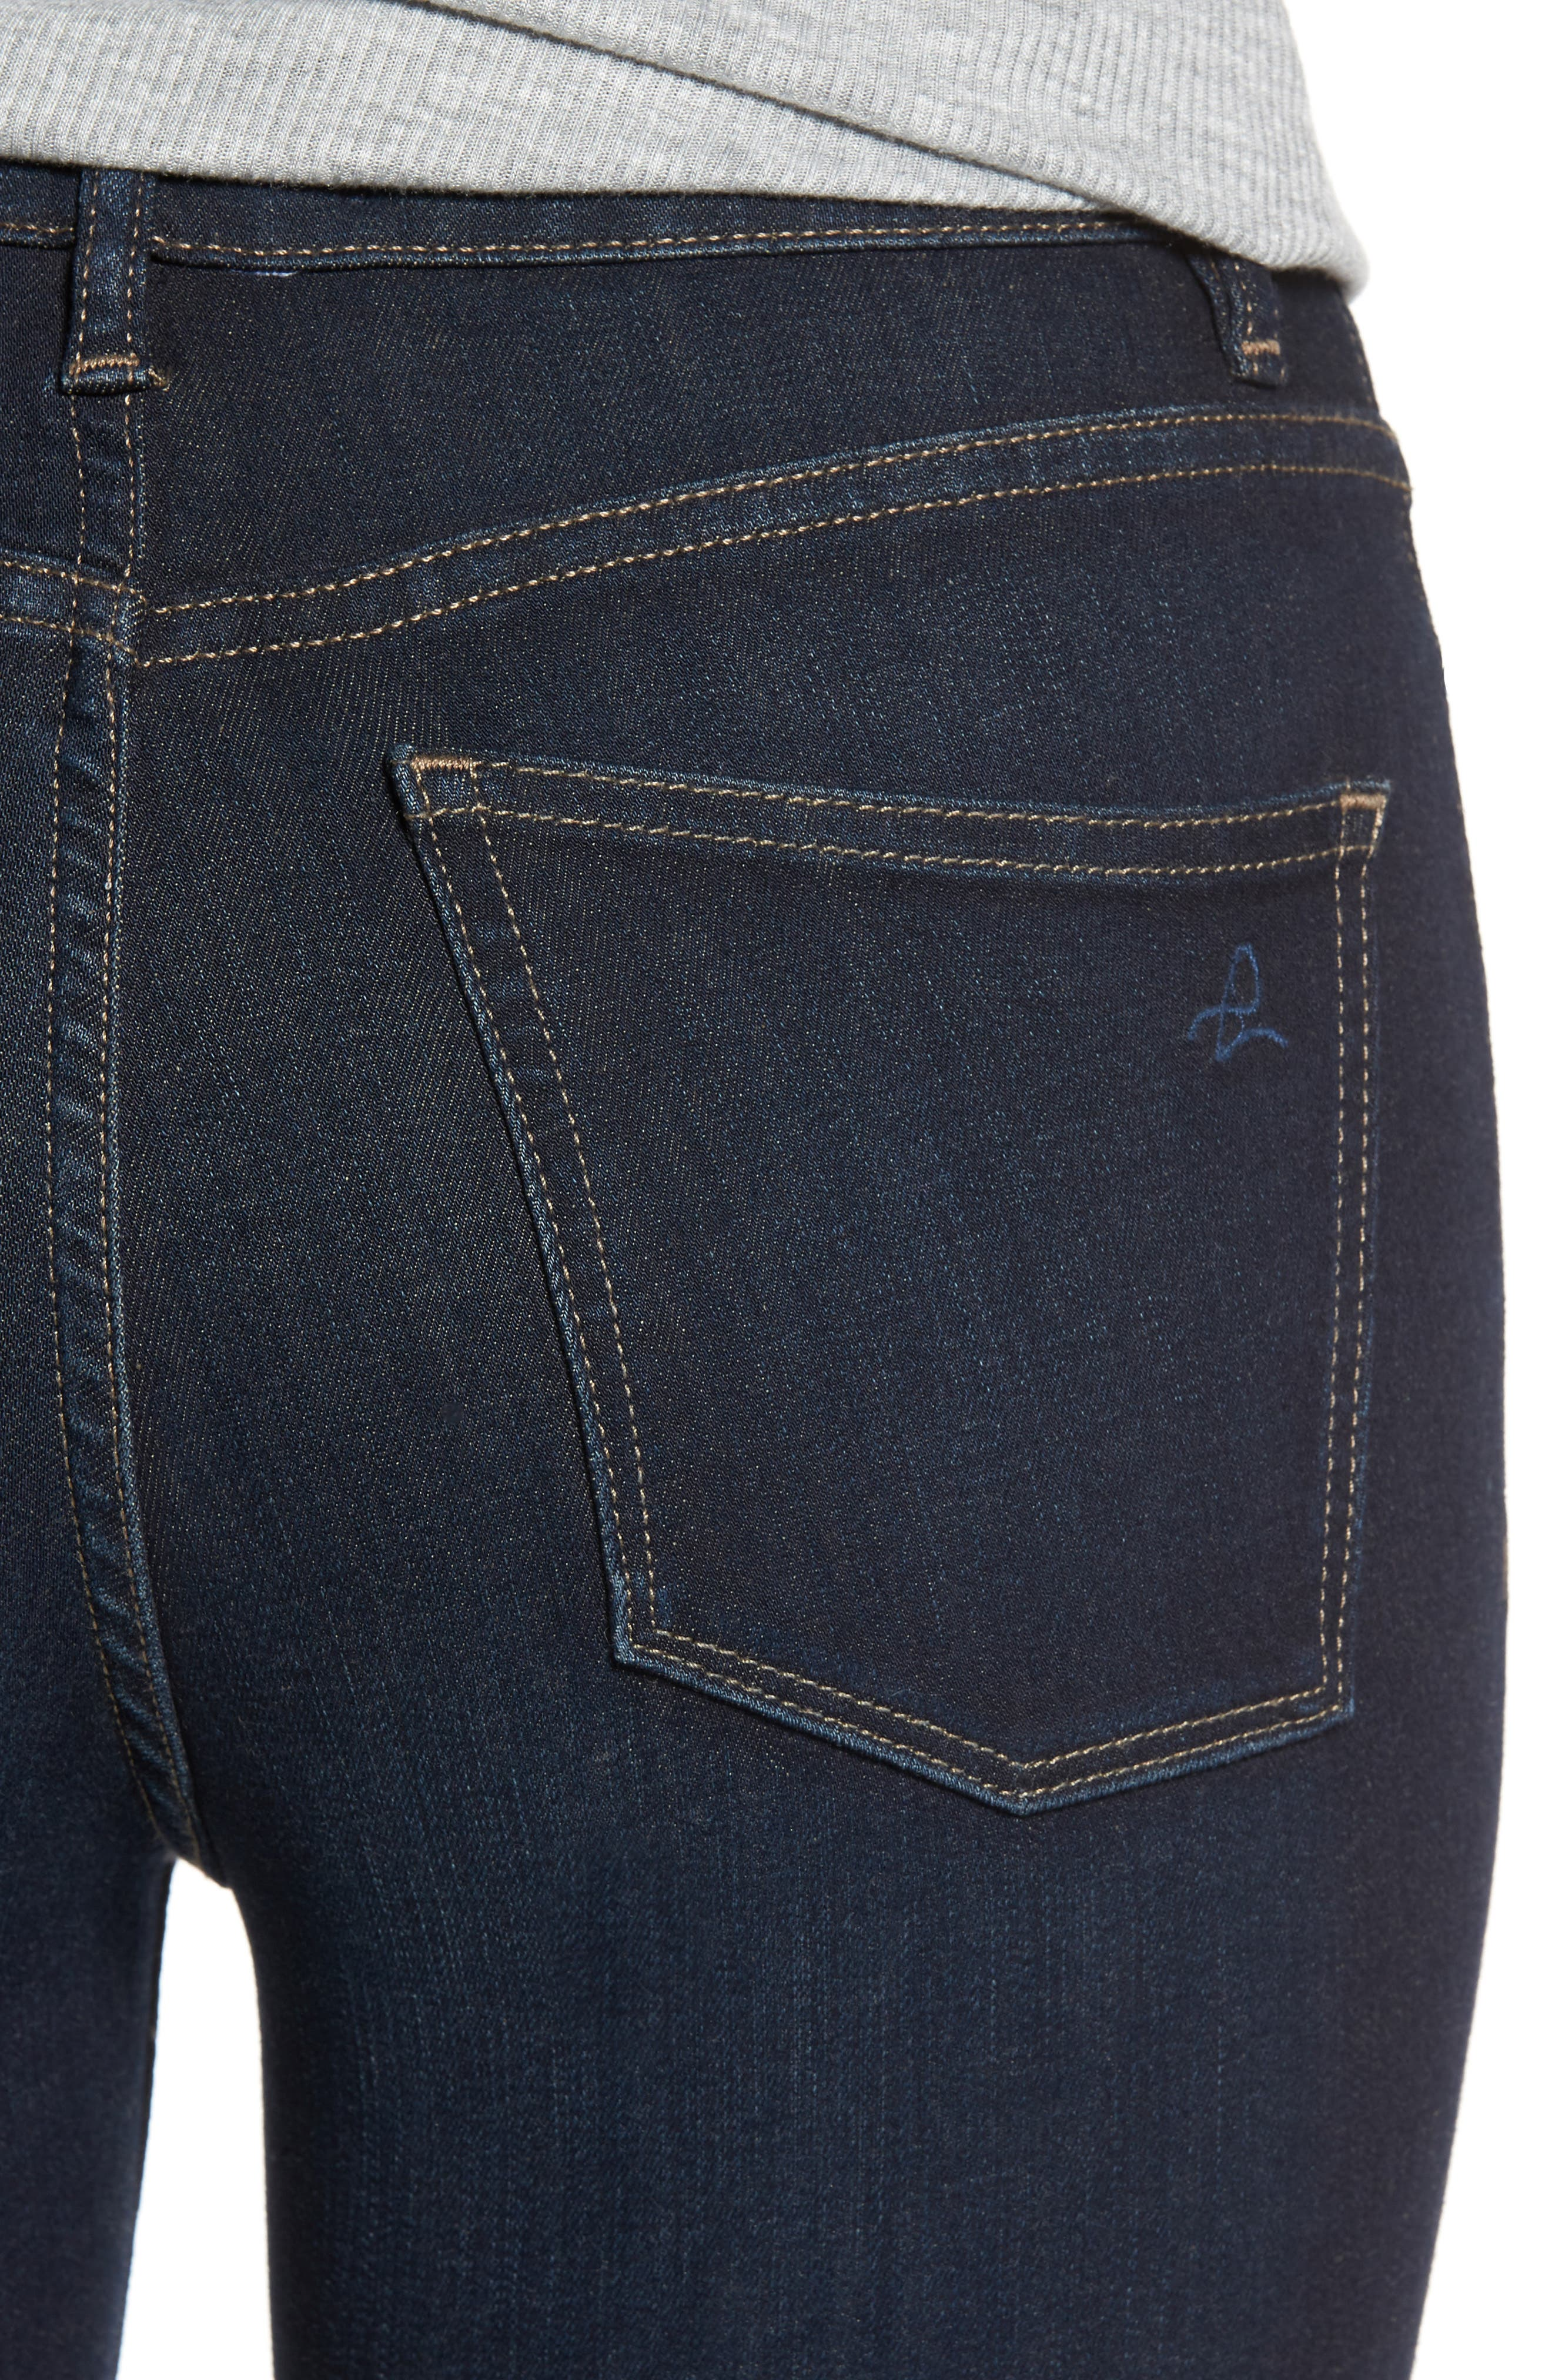 Chrissy High Waist Ankle Skinny Jeans,                             Alternate thumbnail 4, color,                             405